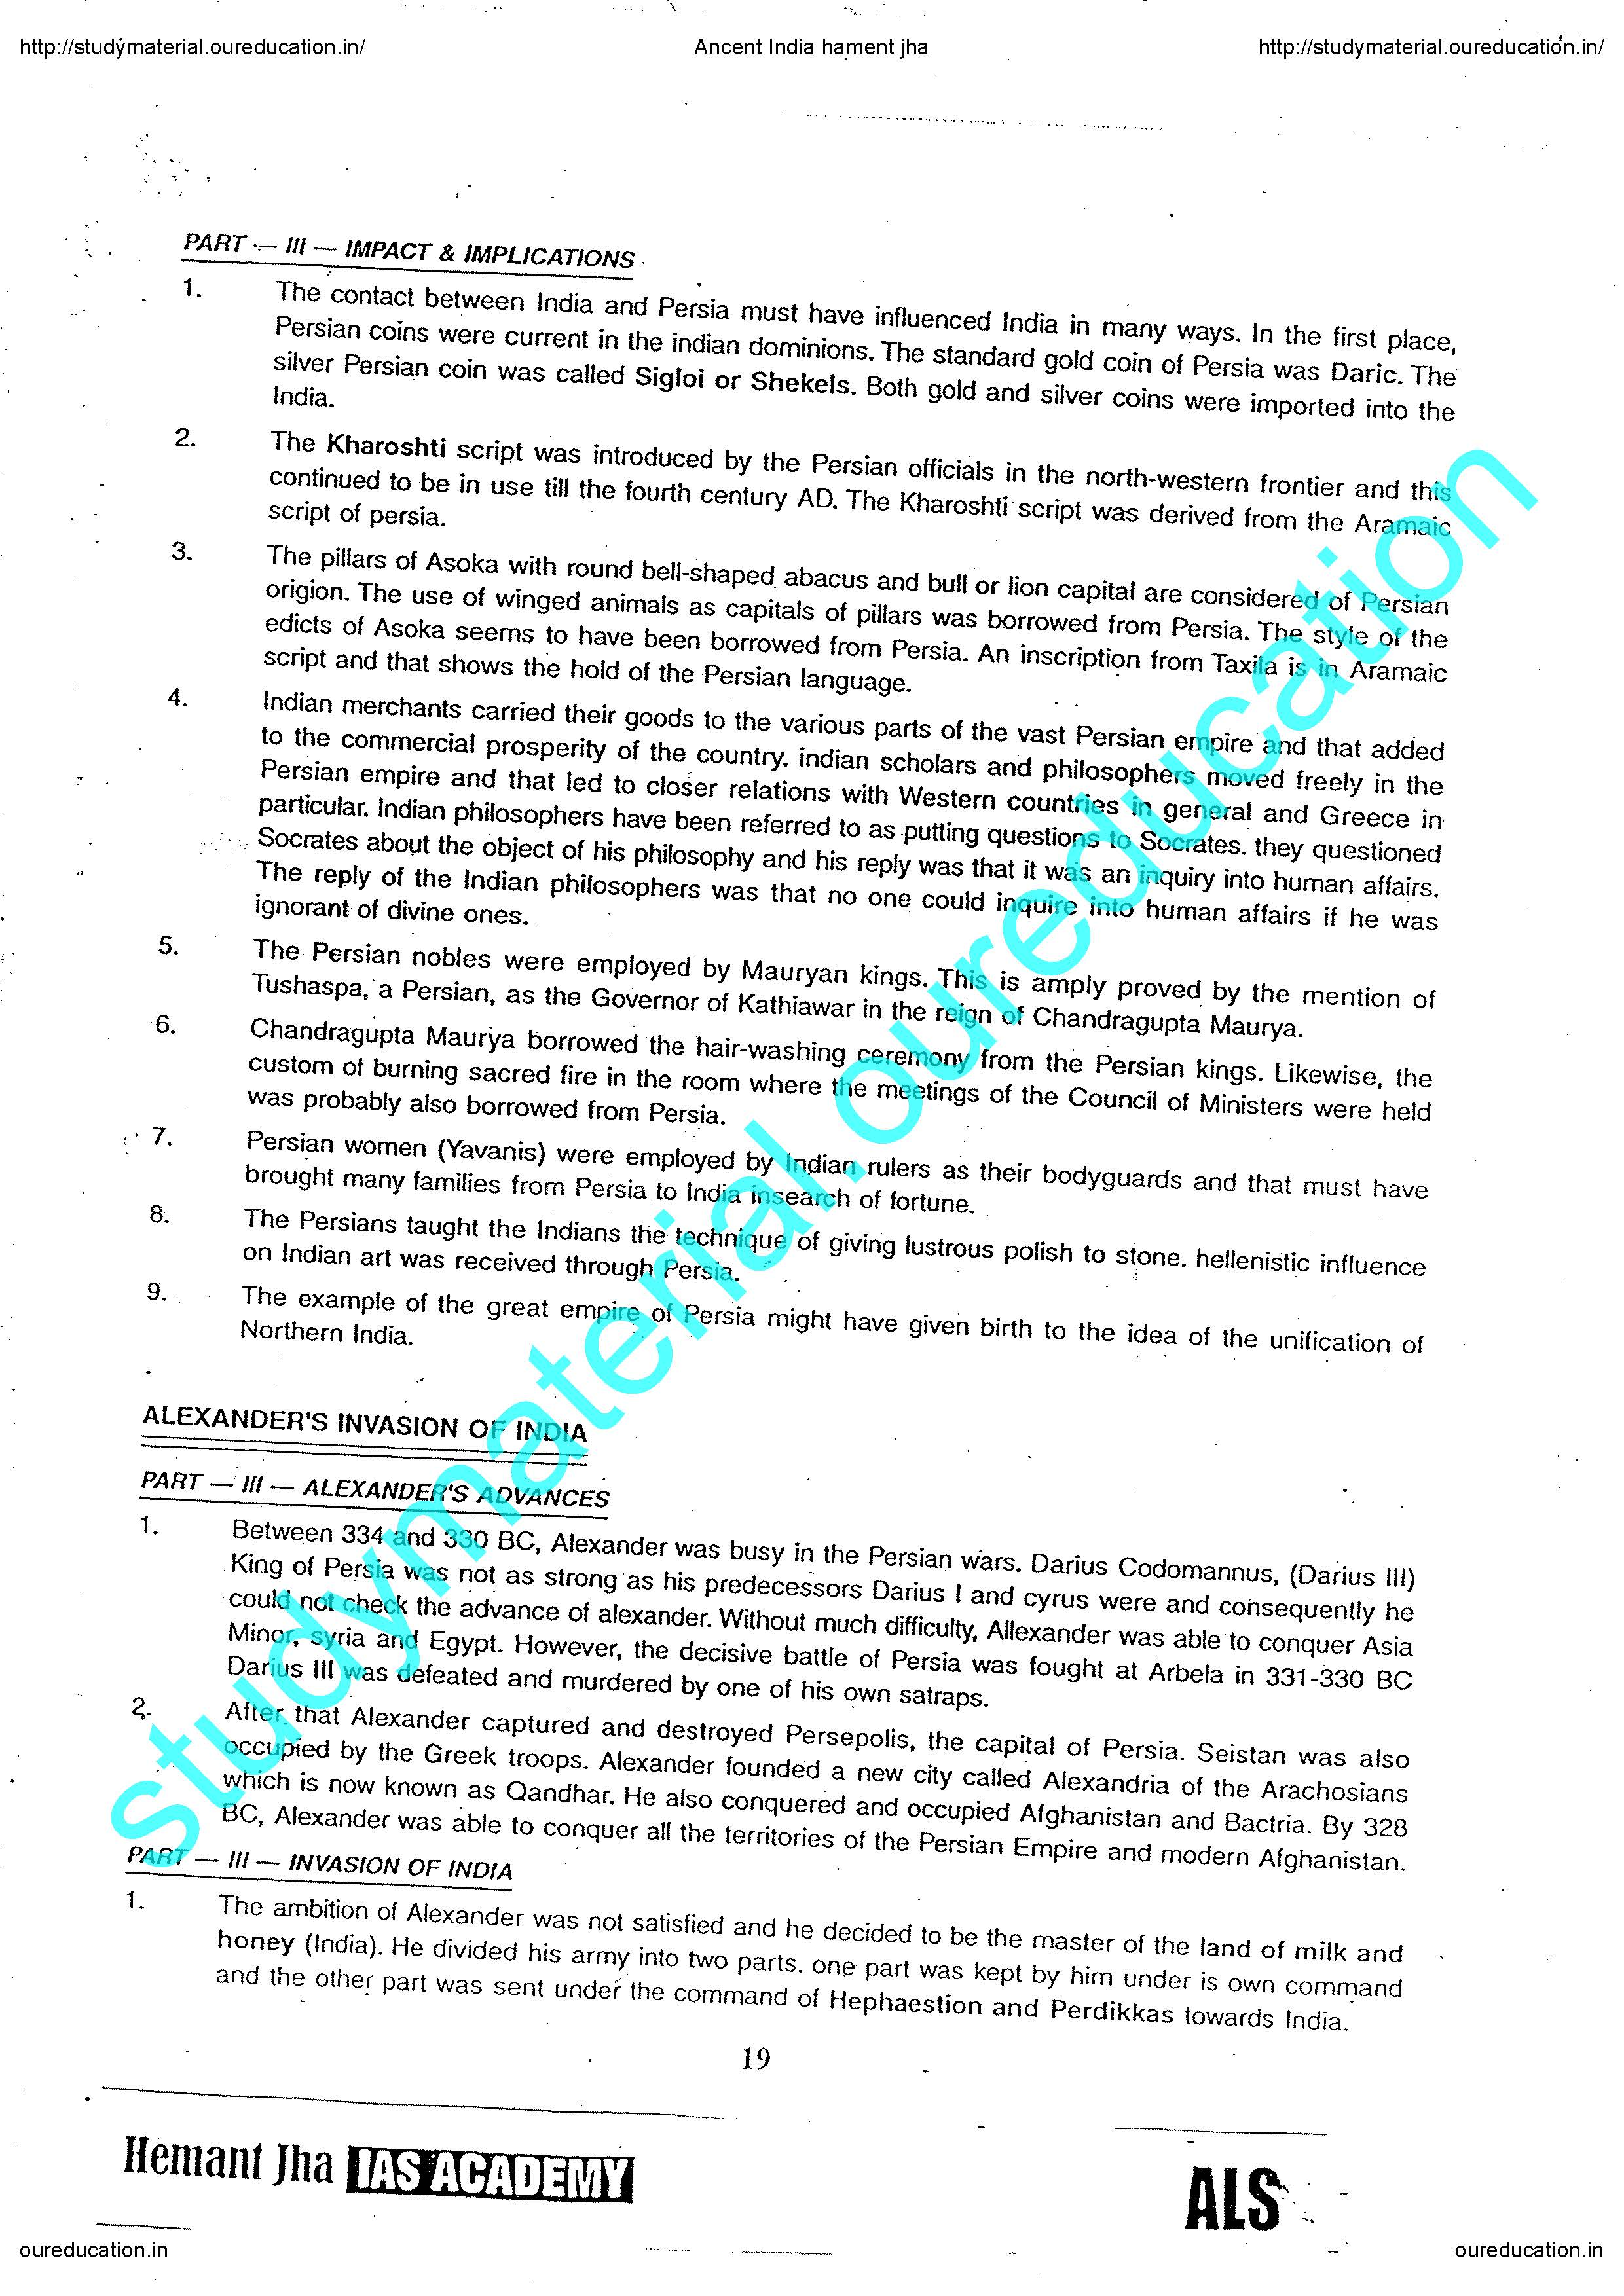 HINDU NOTES-NOVEMBER 24 2018 [UPSC IAS Current affairs]